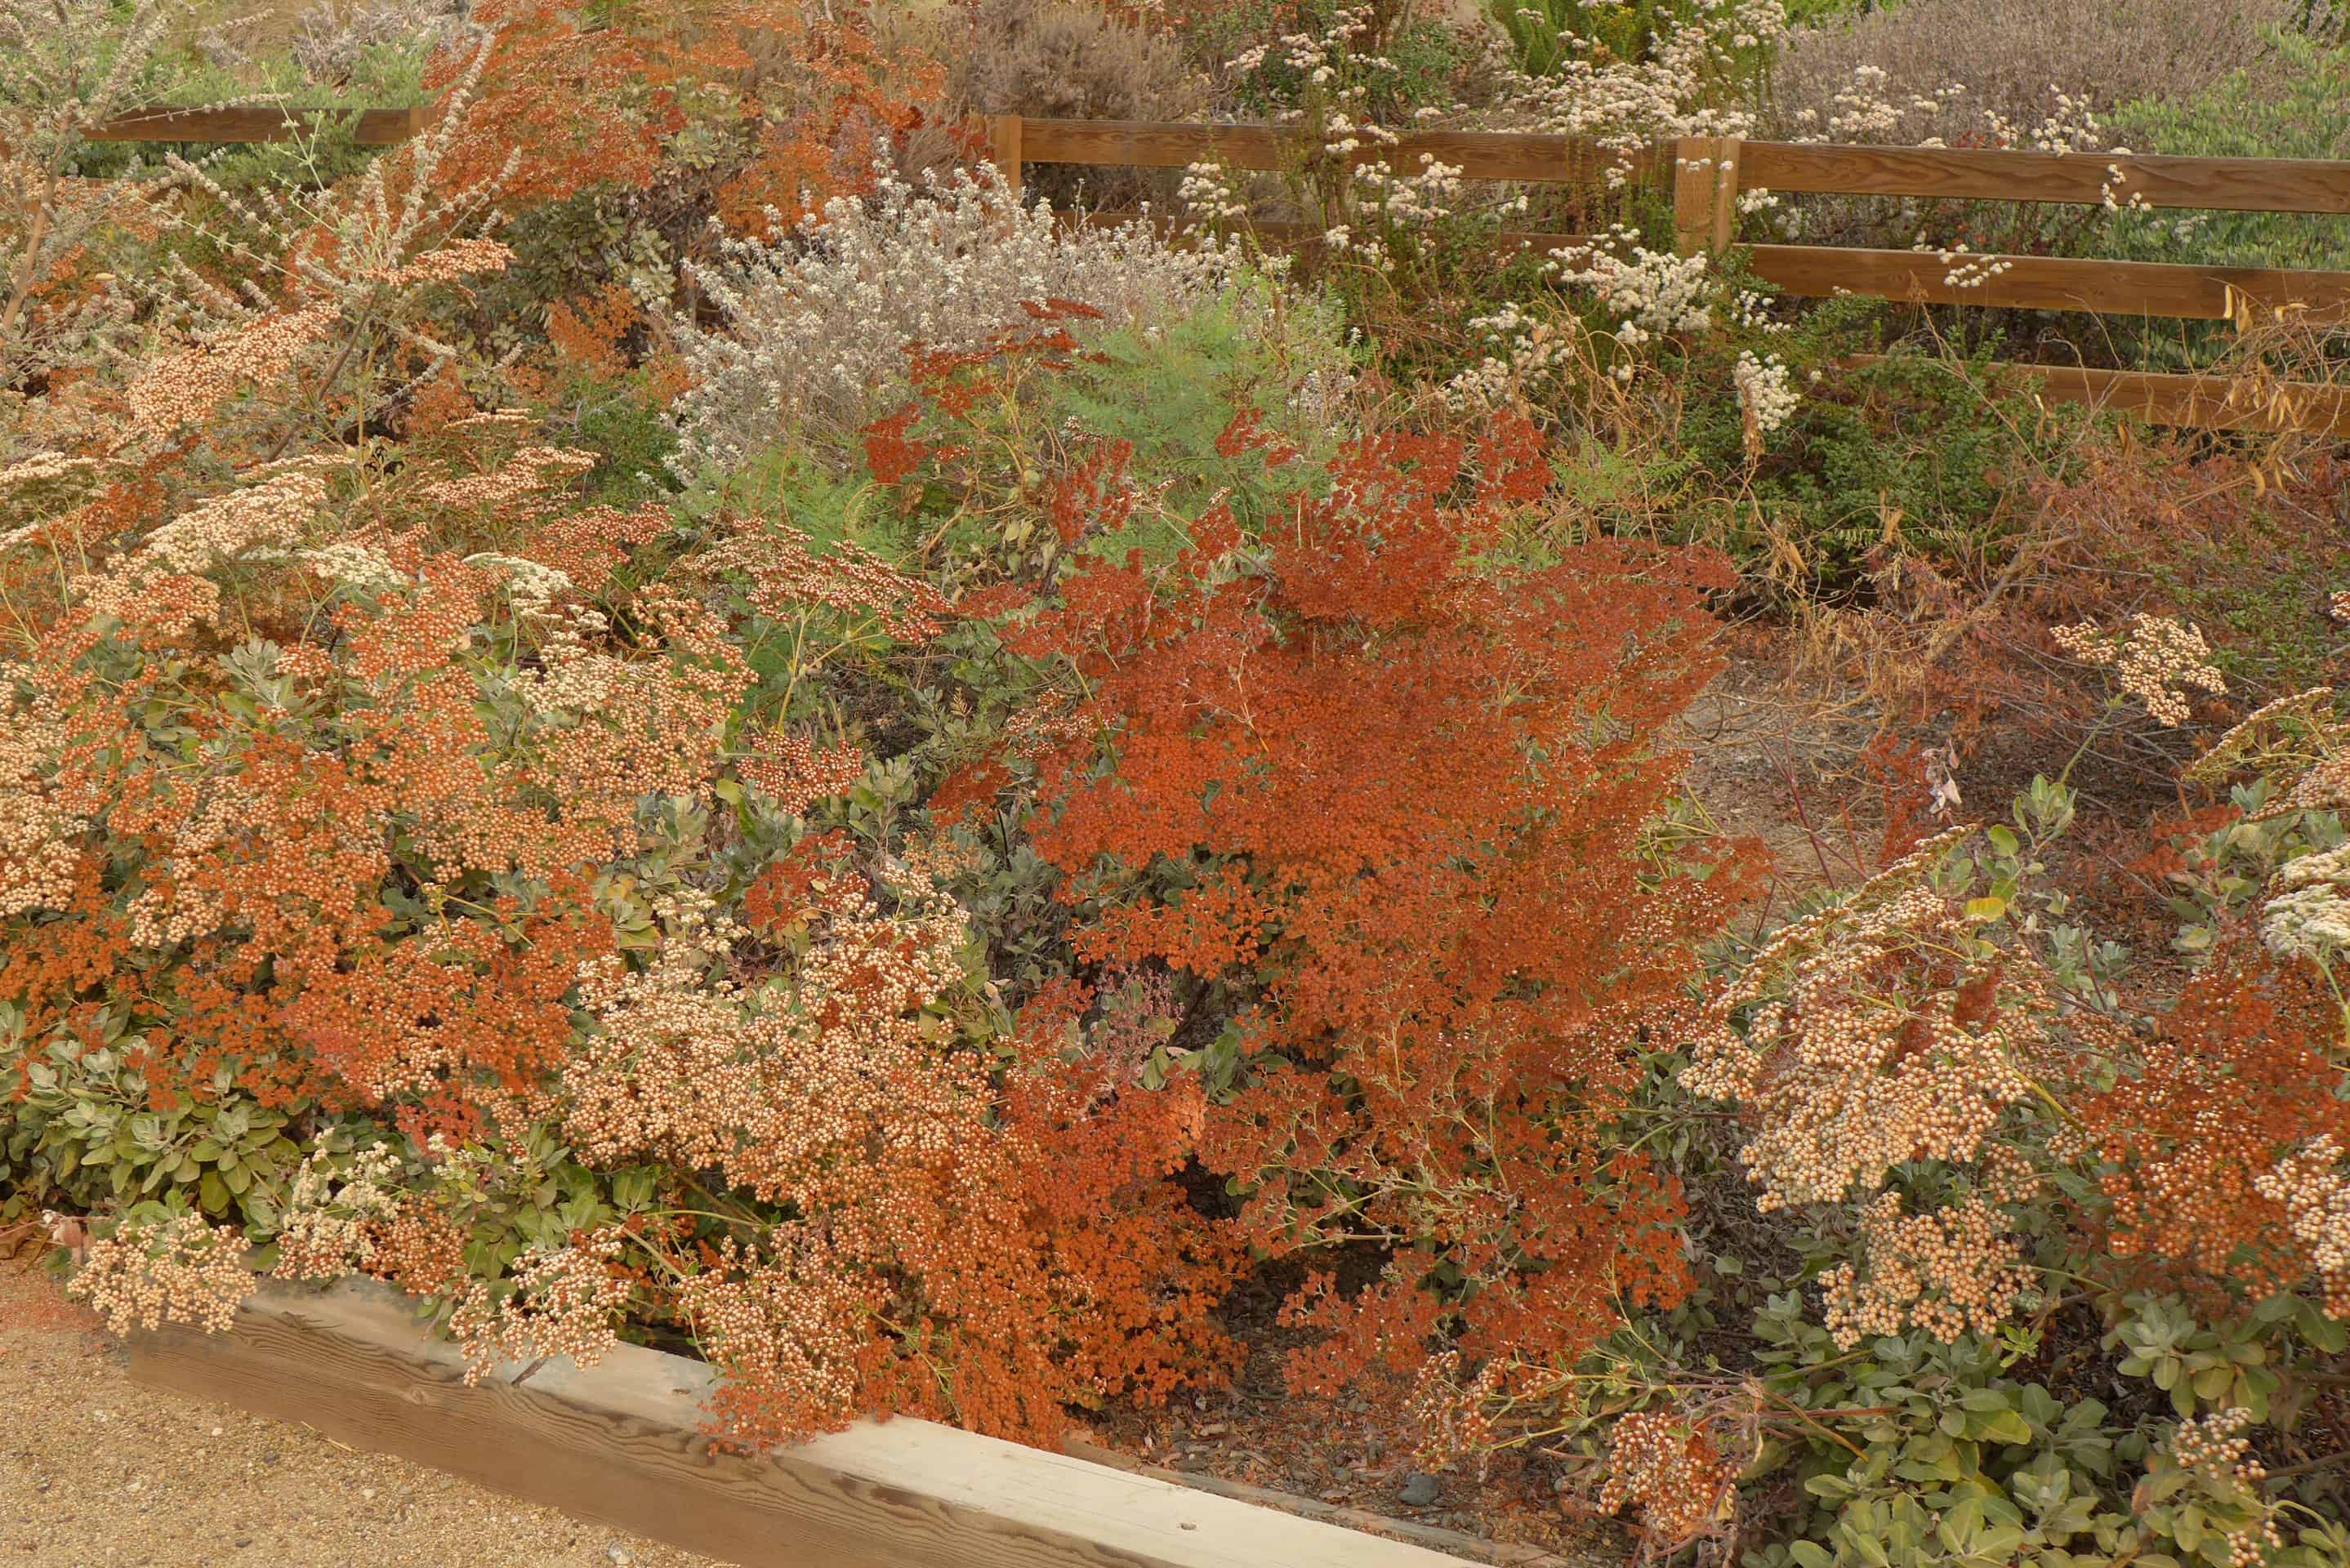 October in the Natural Garden – Tree of Life Nursery